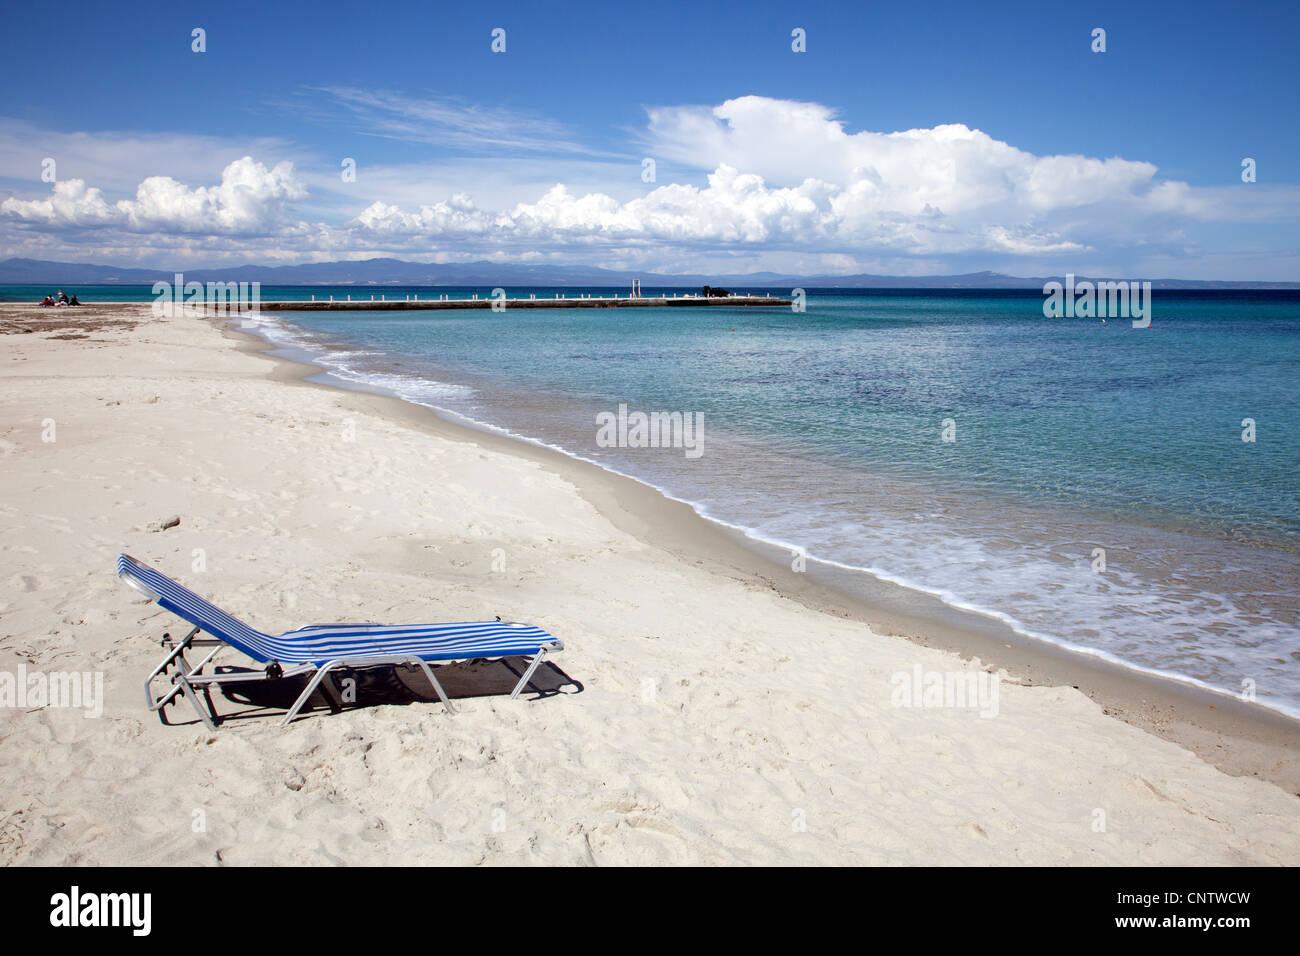 kallithea beach stockfotos kallithea beach bilder alamy. Black Bedroom Furniture Sets. Home Design Ideas